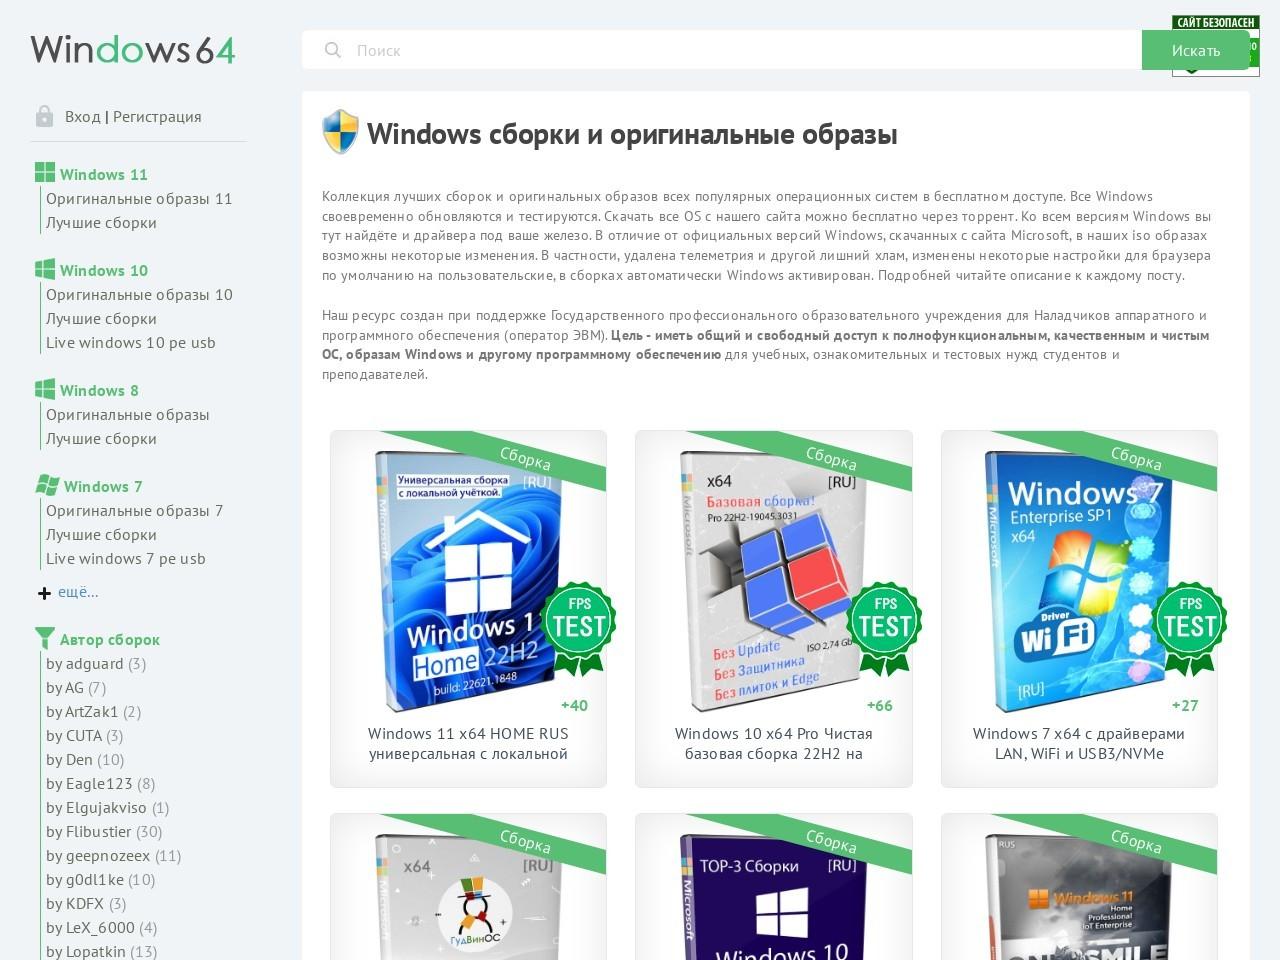 windows64.net